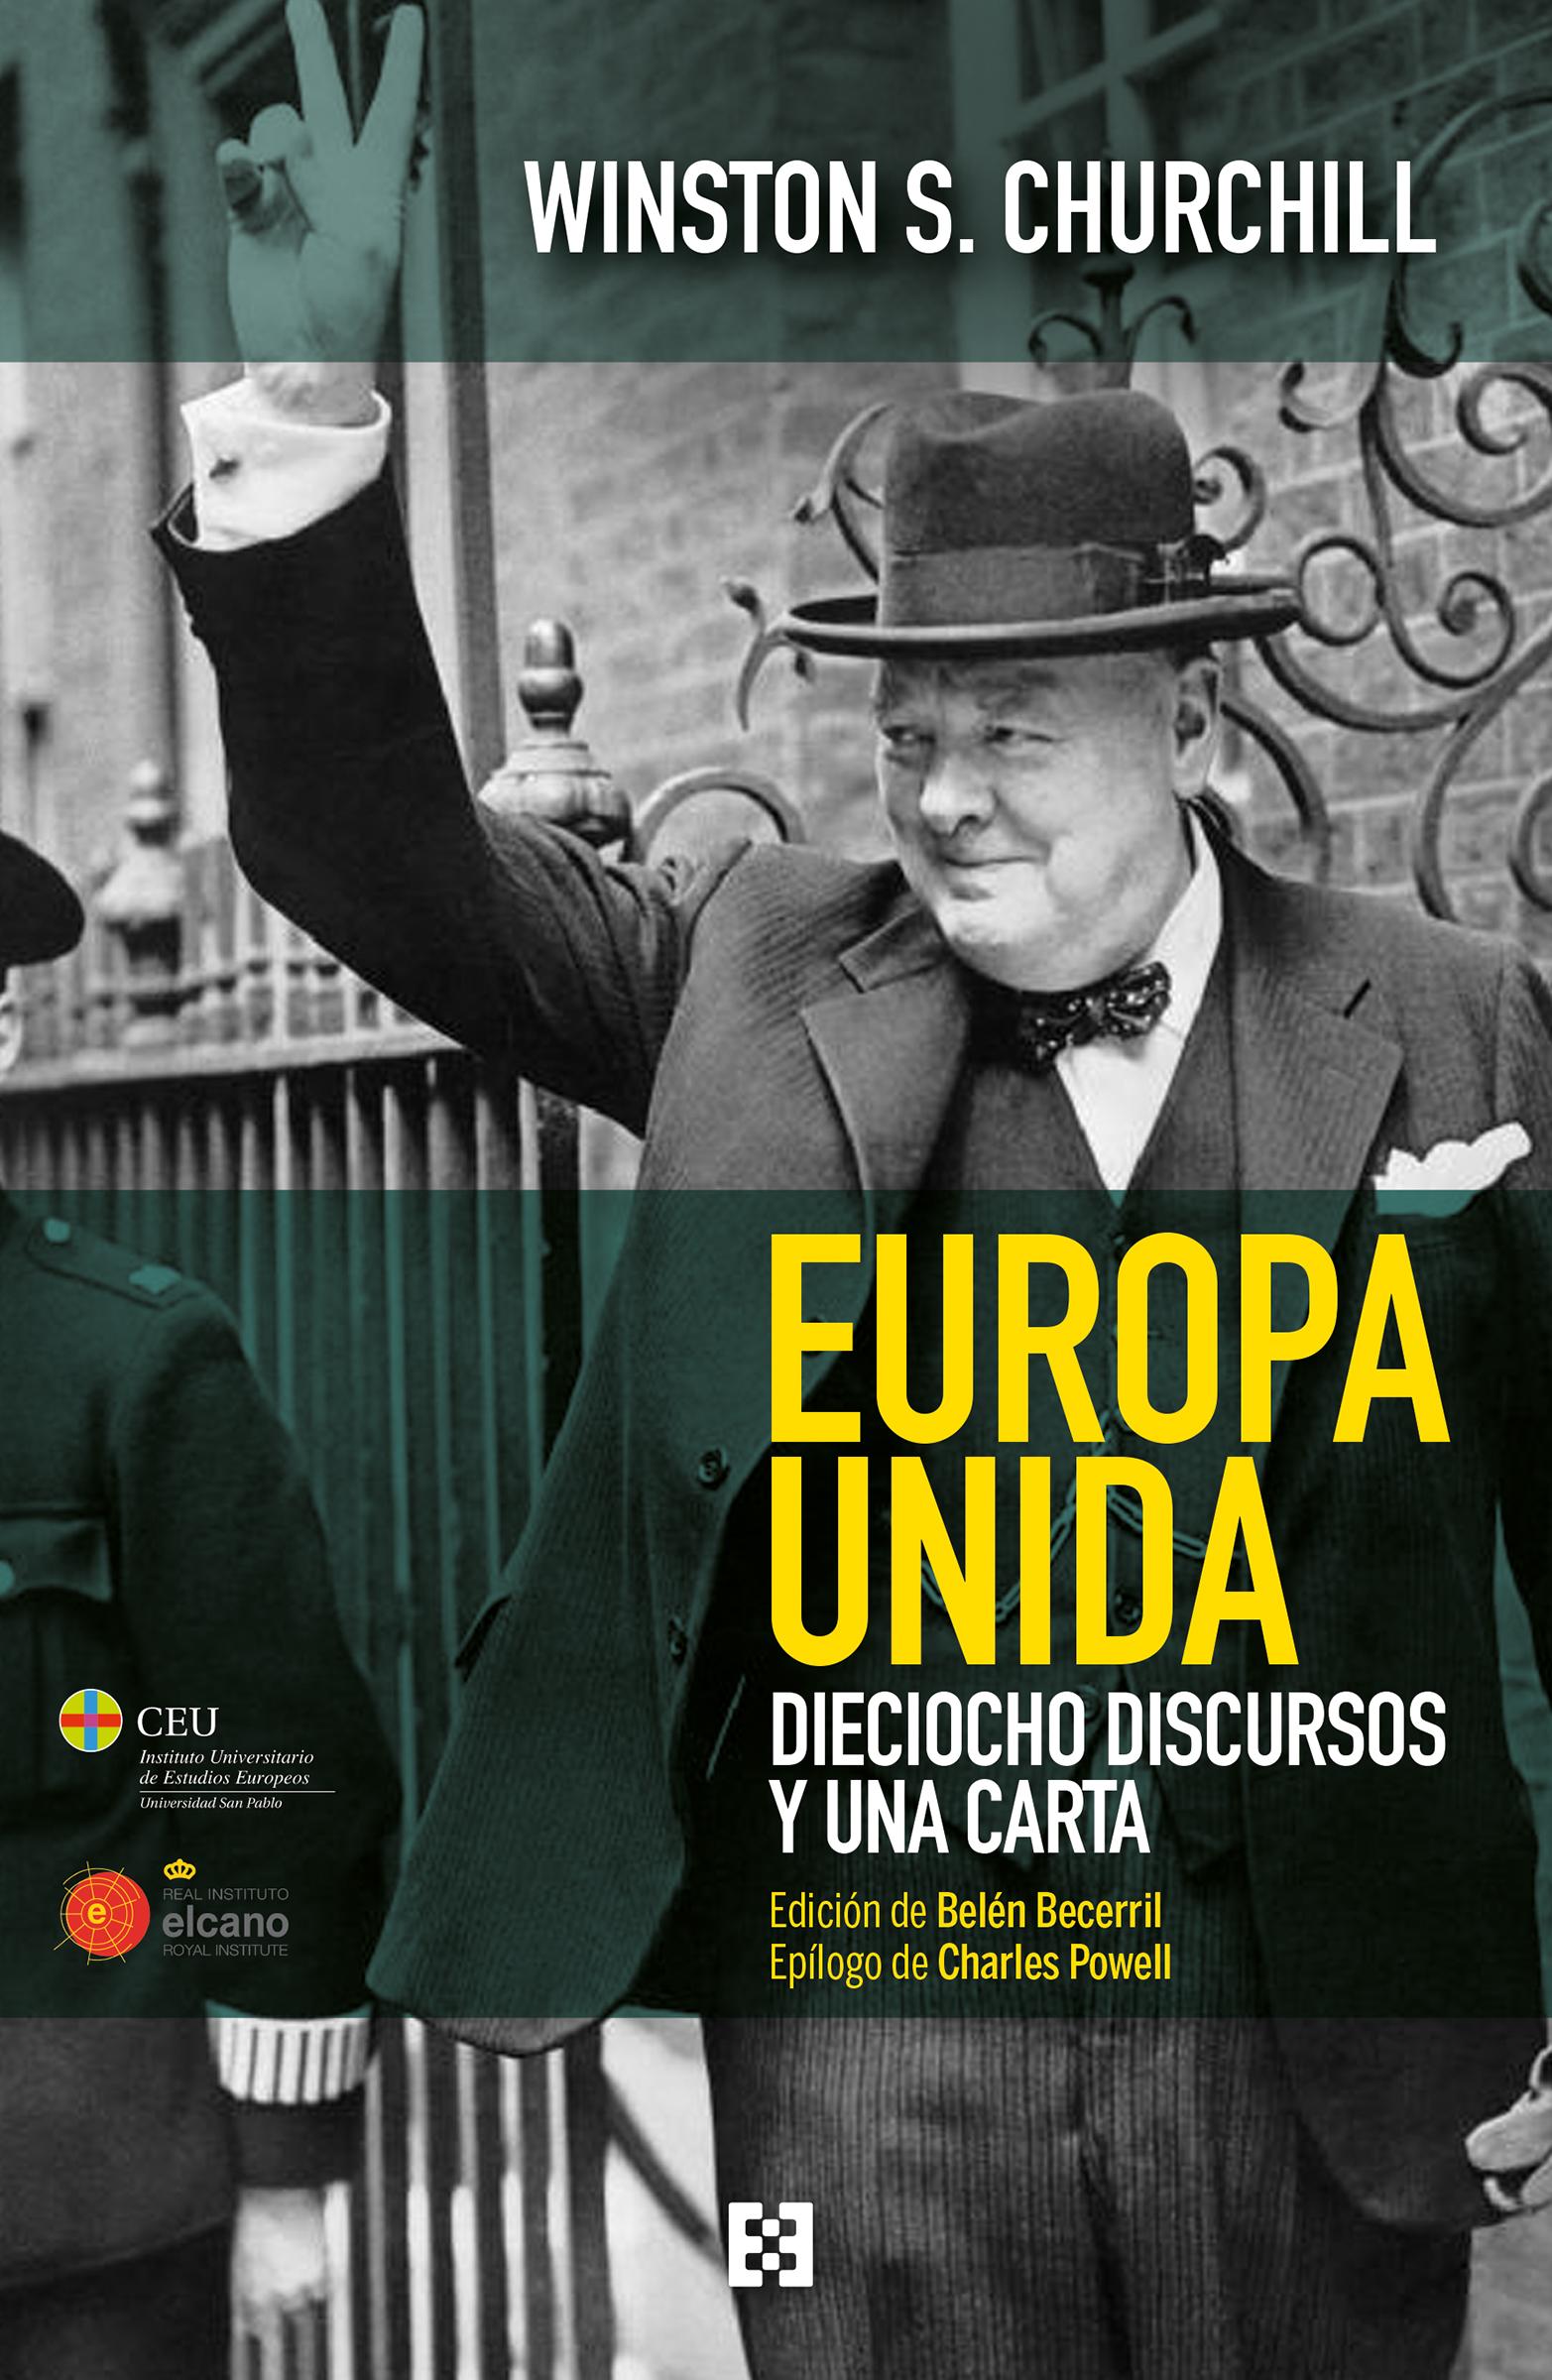 Europa unida, según Churchill